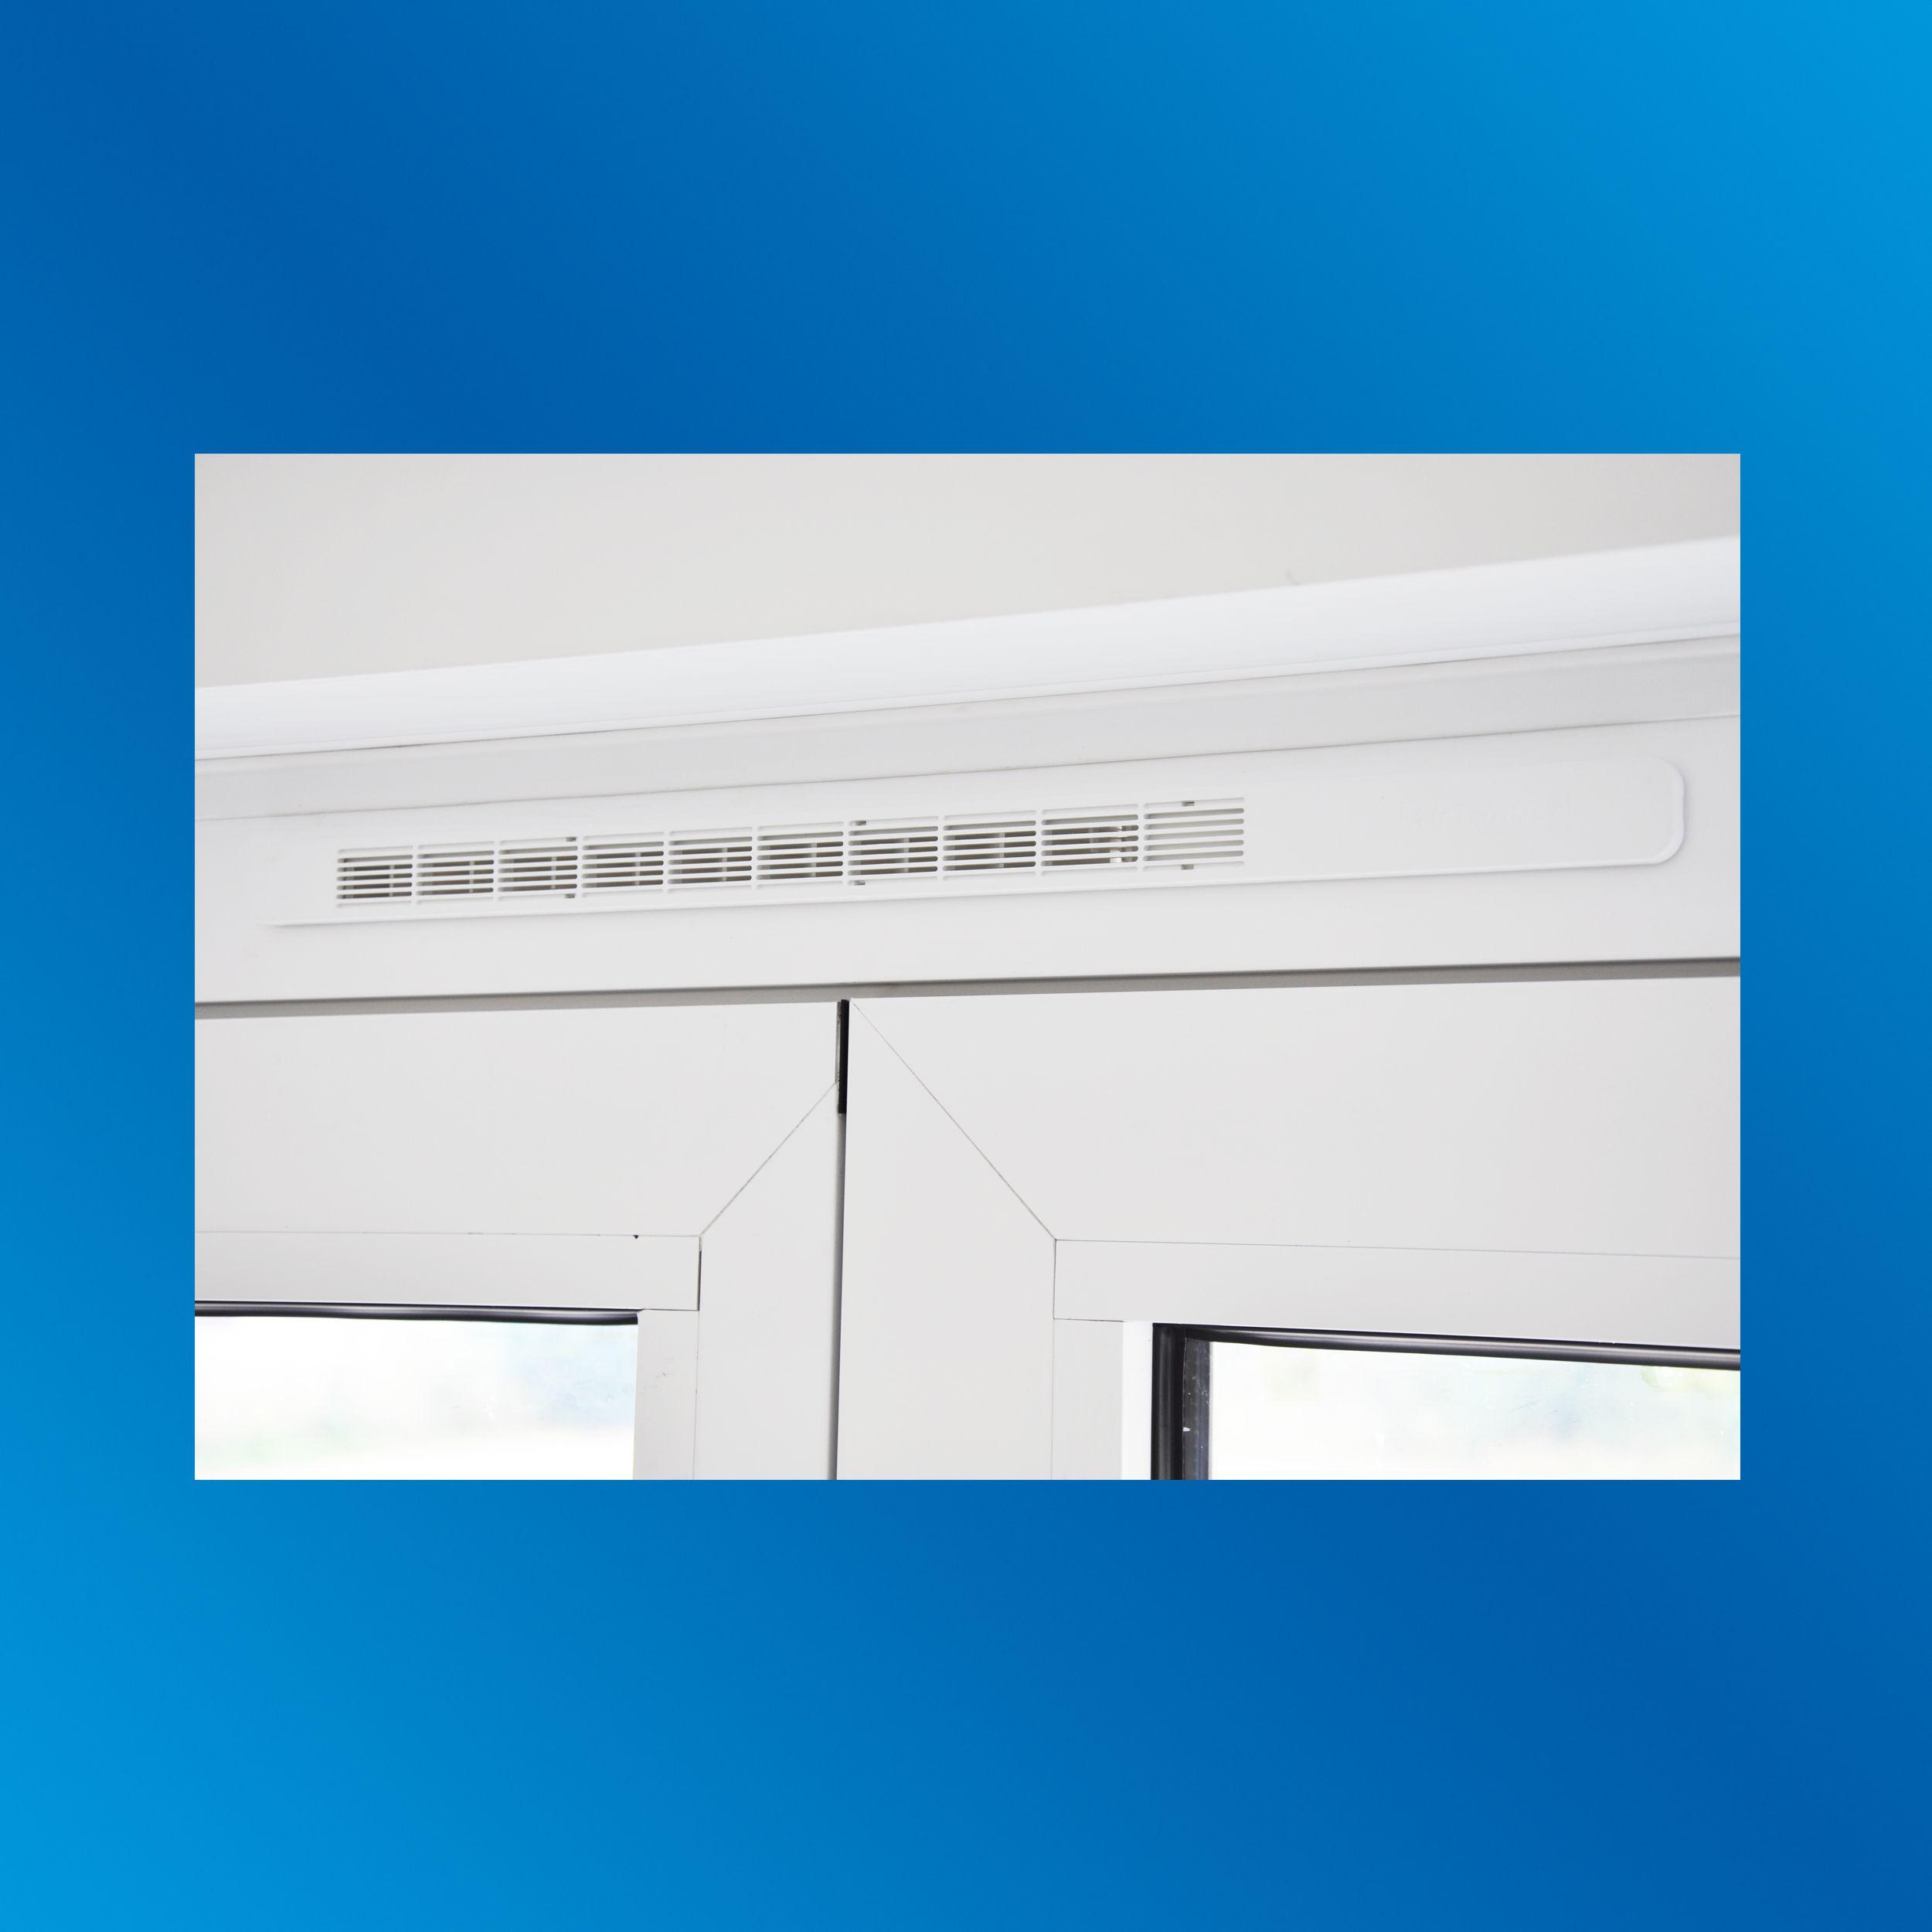 Fensterlüfter AirTronic Innenansicht